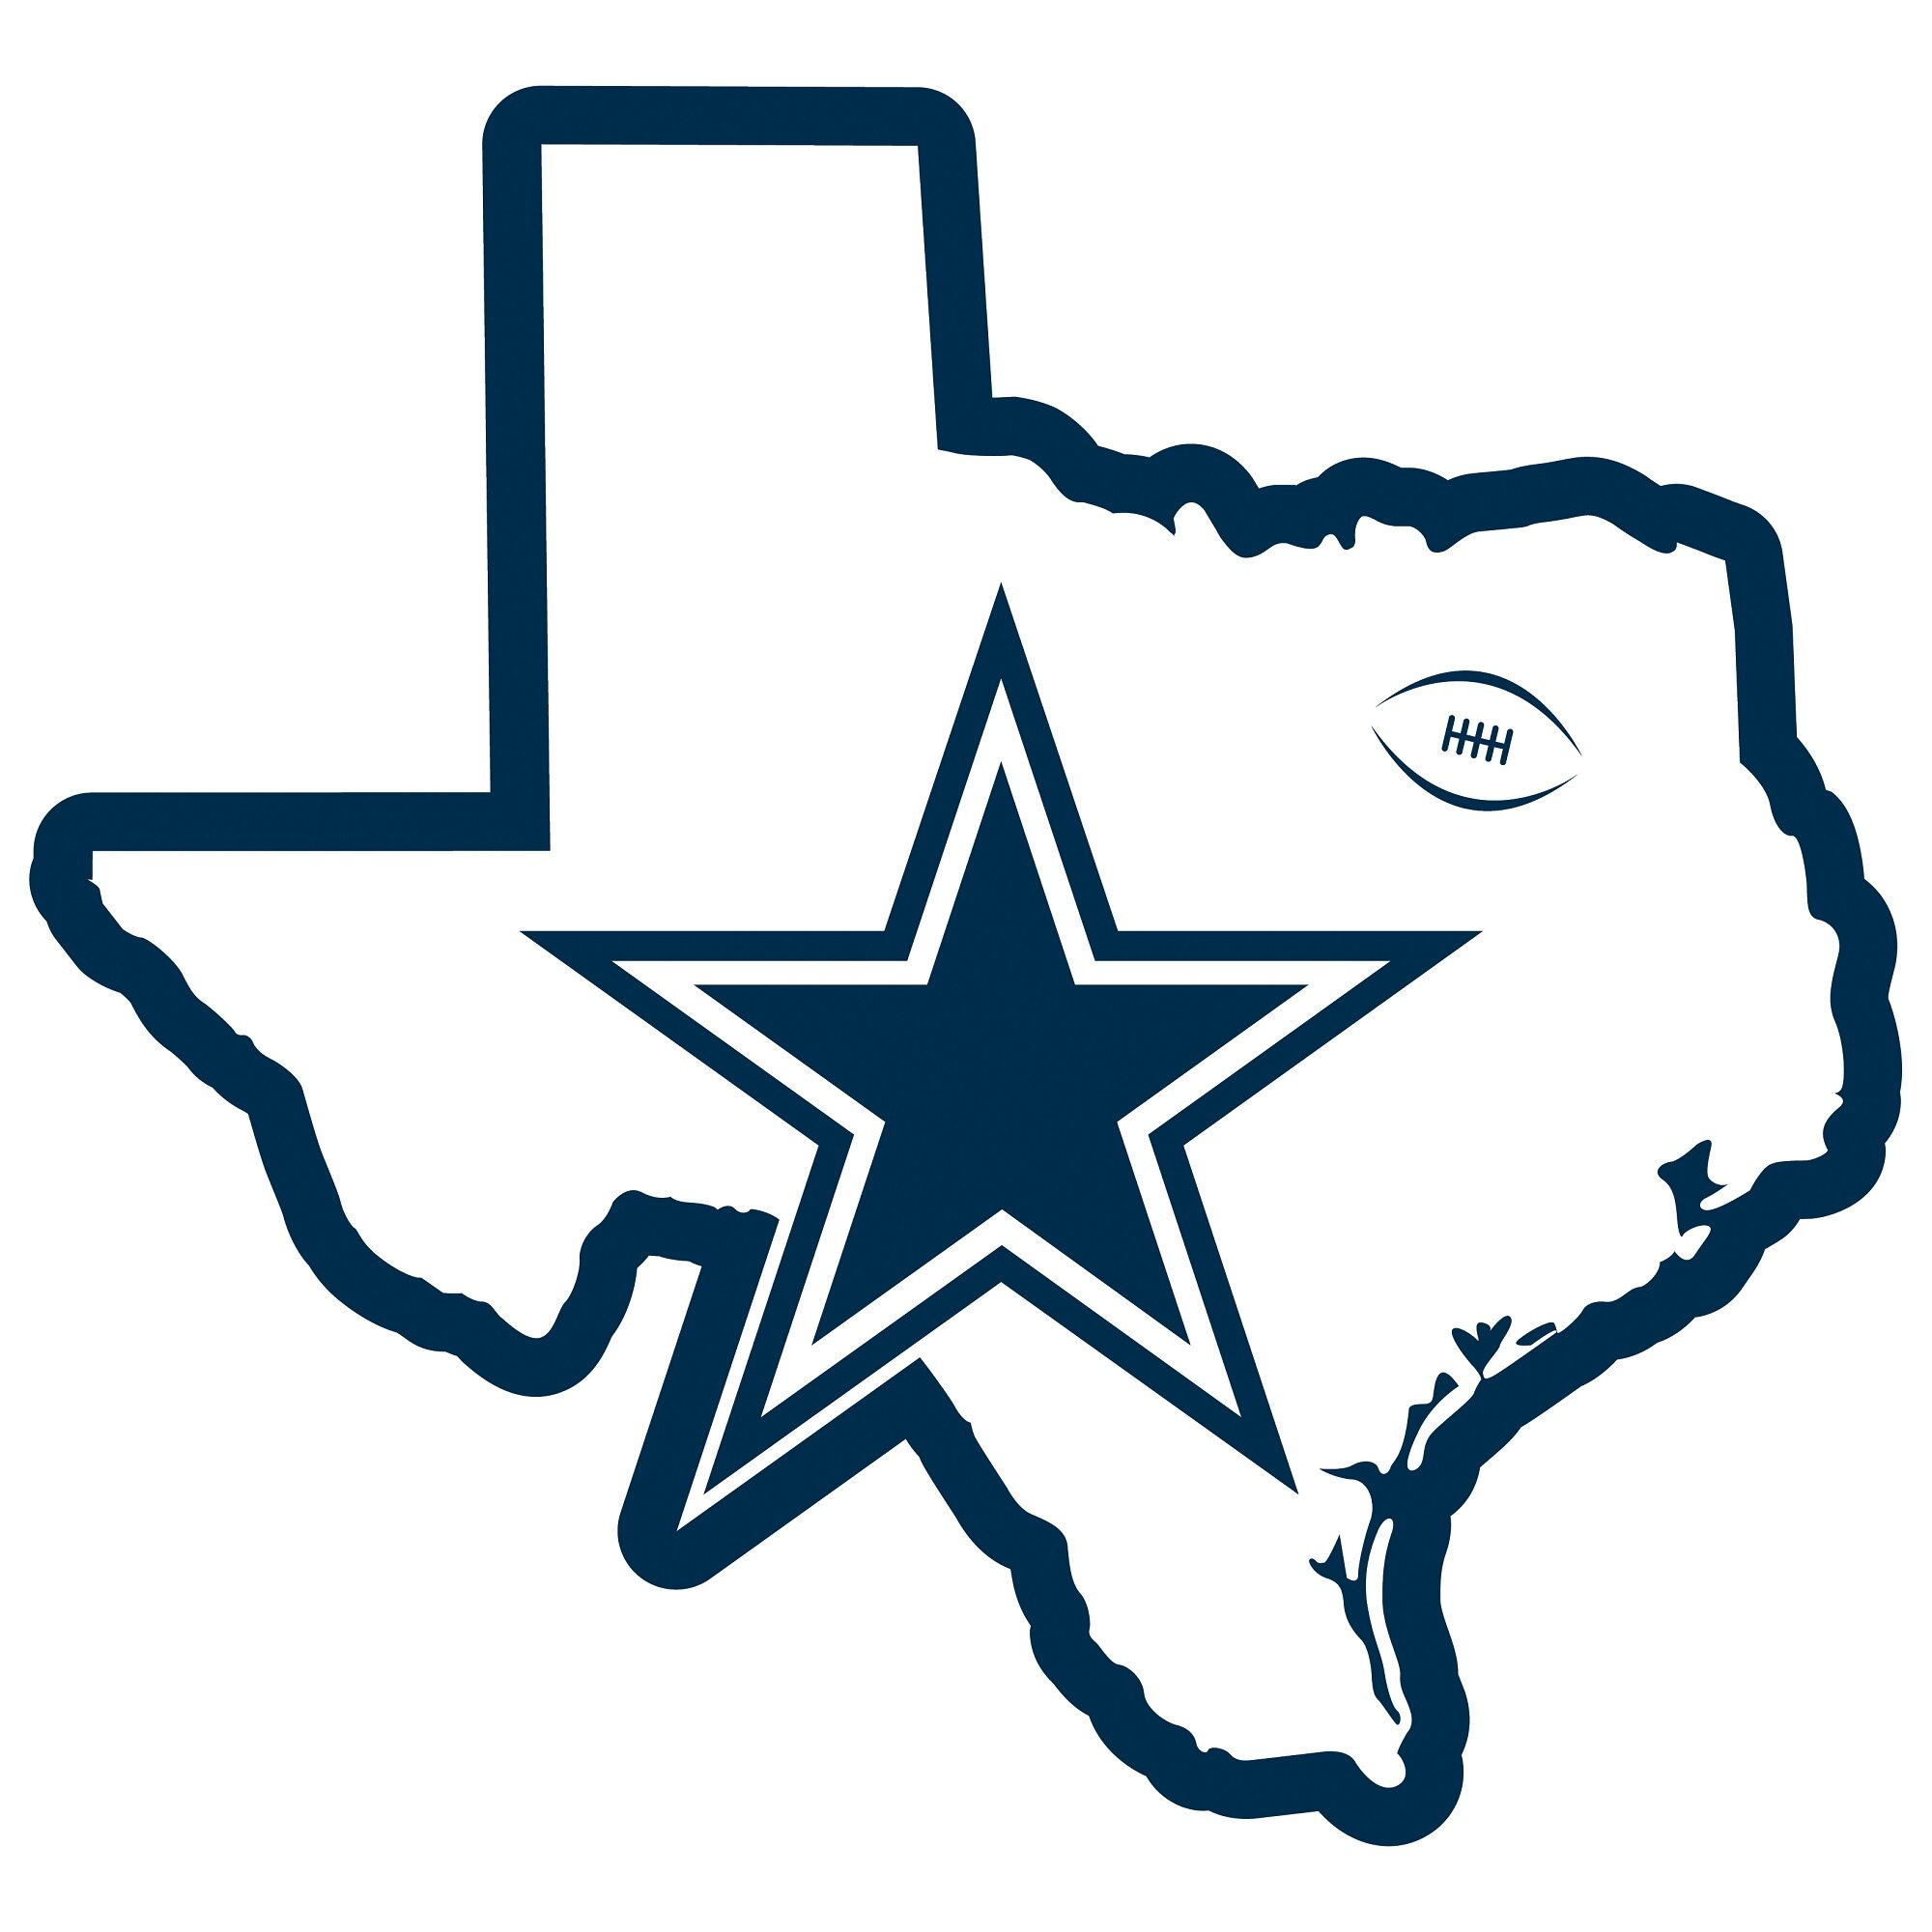 2a20f5e3 NFL Dallas Cowboys Home State Magnet